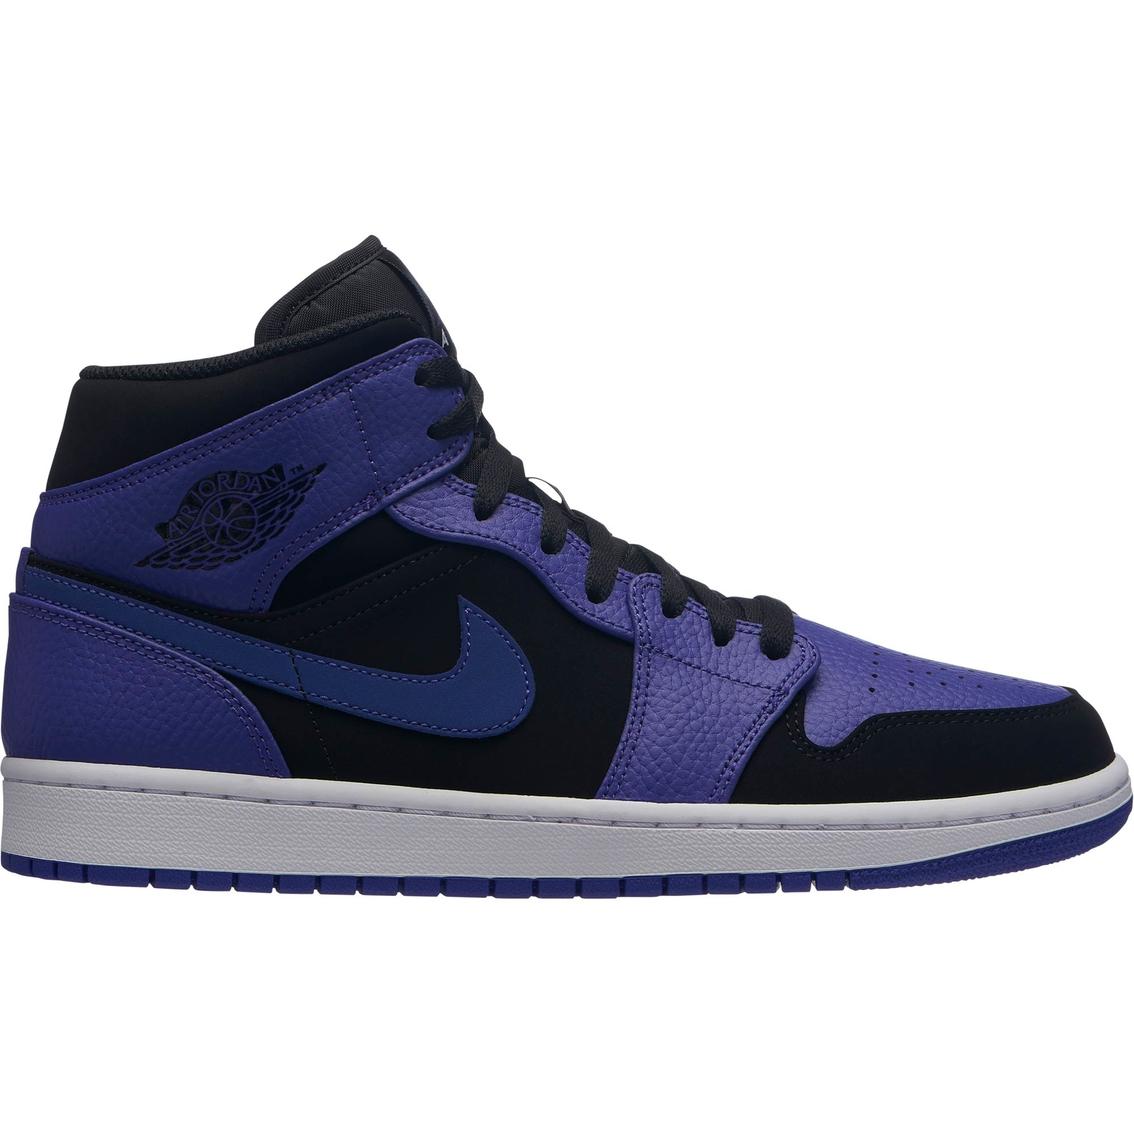 5abe7a5a0b0b Jordan Men s Air Jordan 1 Mid Shoes